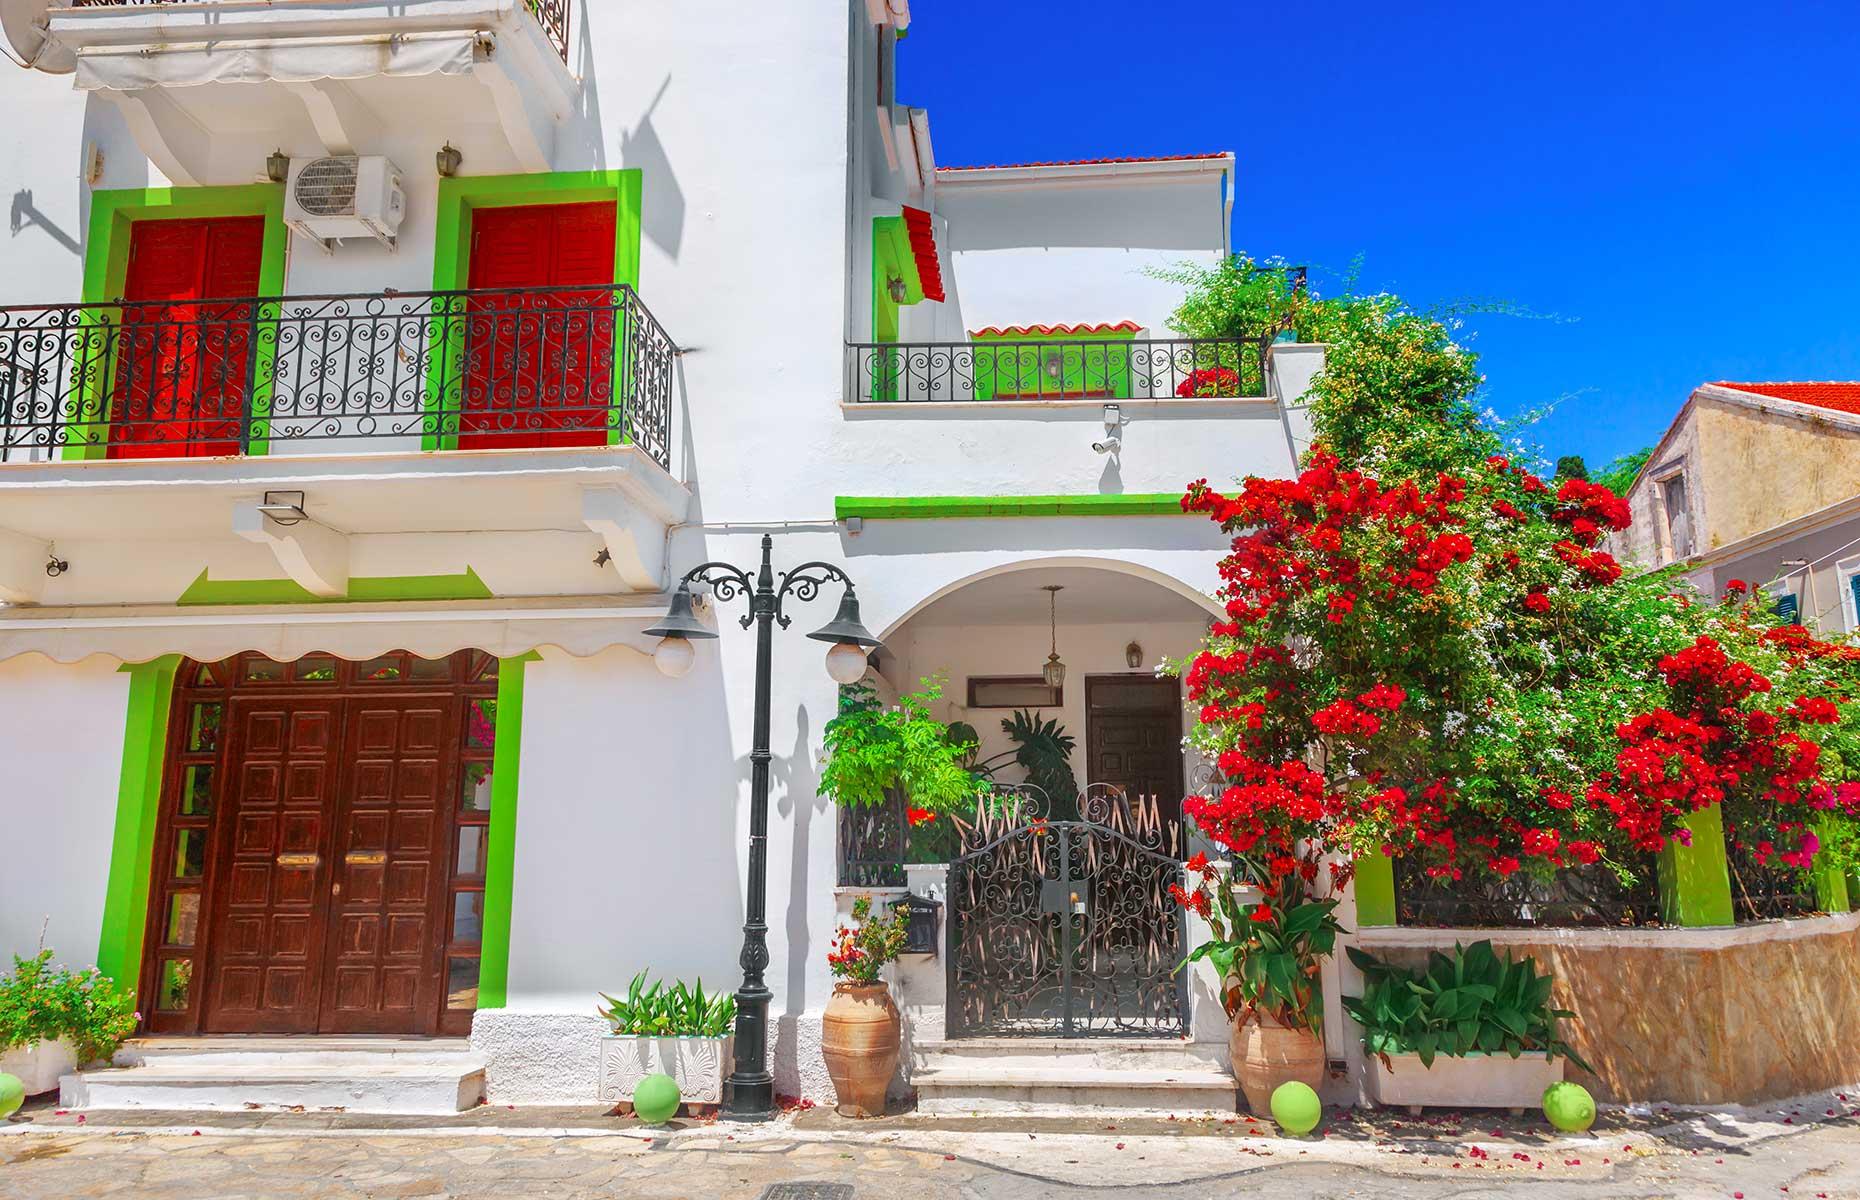 Kefalonia, Greece (Image: Adisa/Shutterstock)